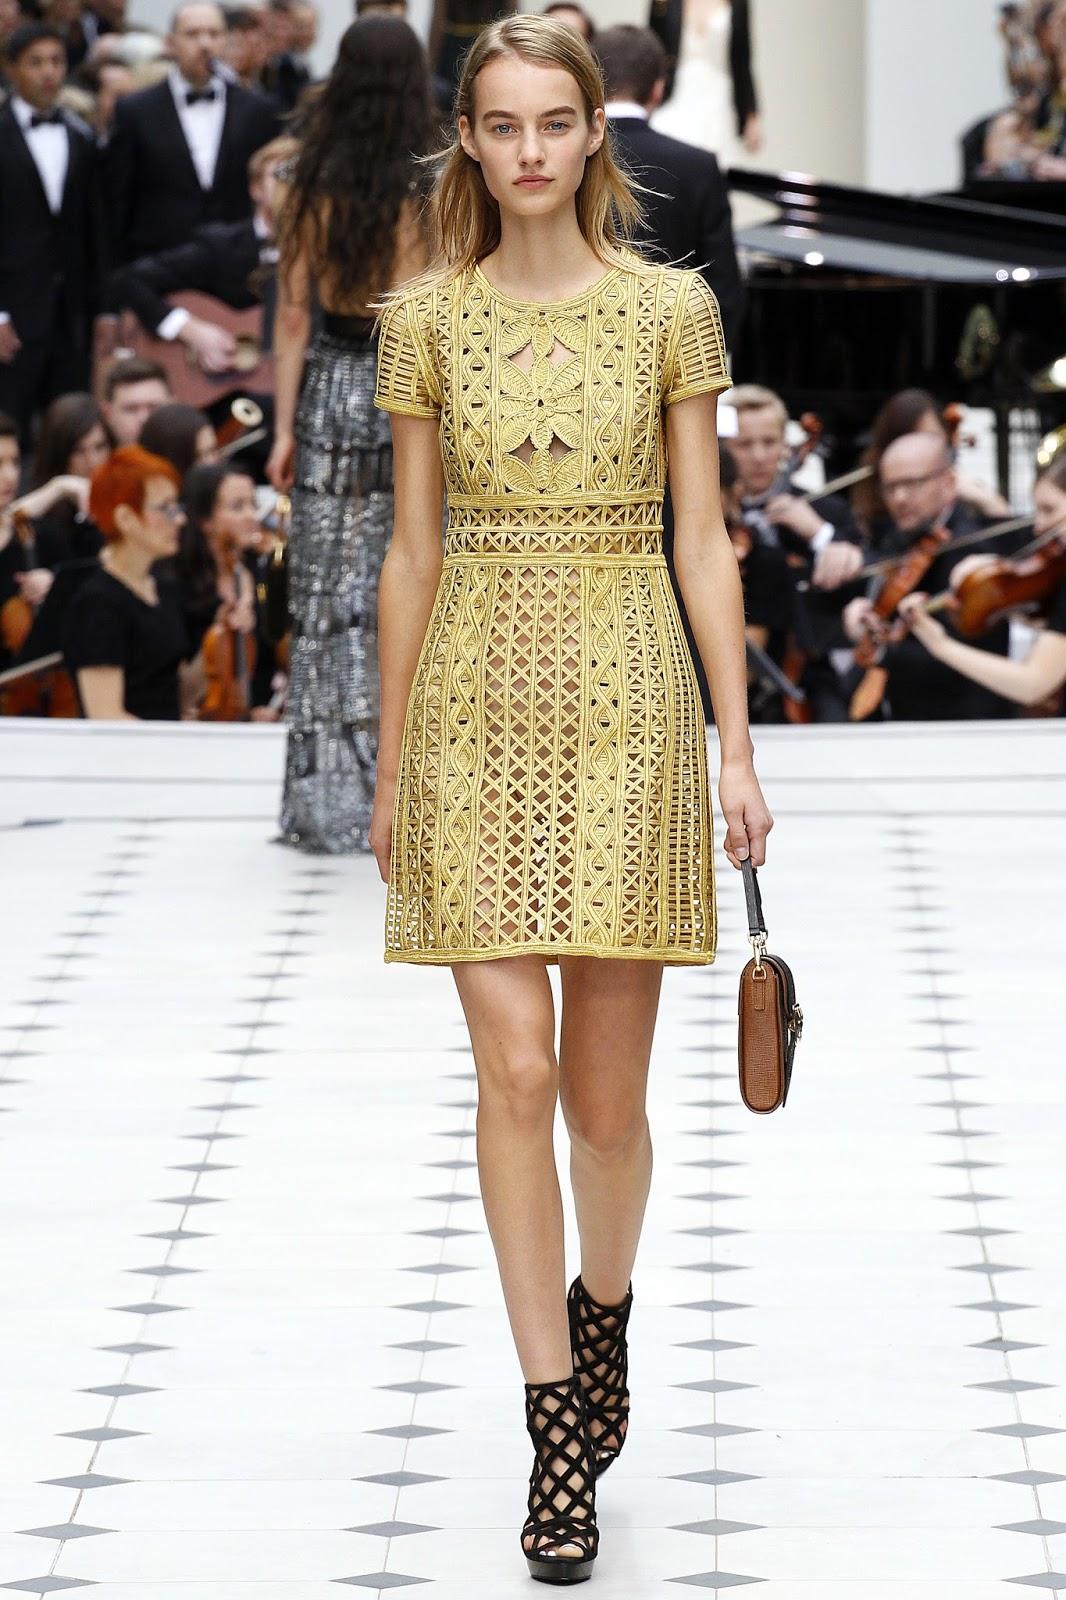 Burberry Prorsum Spring/Summer 2016 / London fashion week via www.fashionedbylove.co.uk